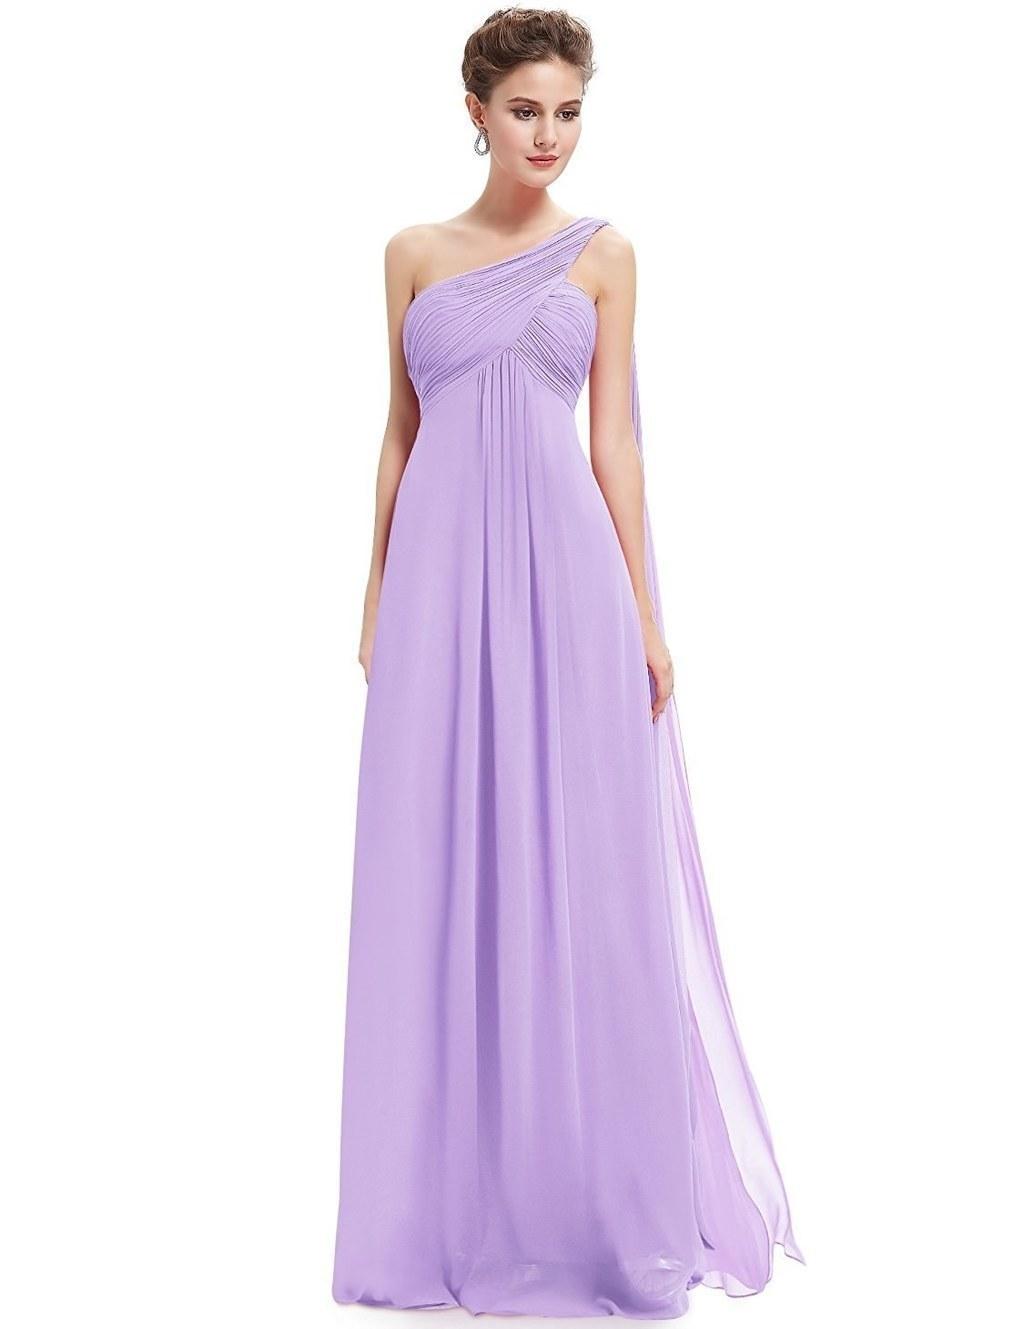 Celebrity evening dresses for less uk yahoo